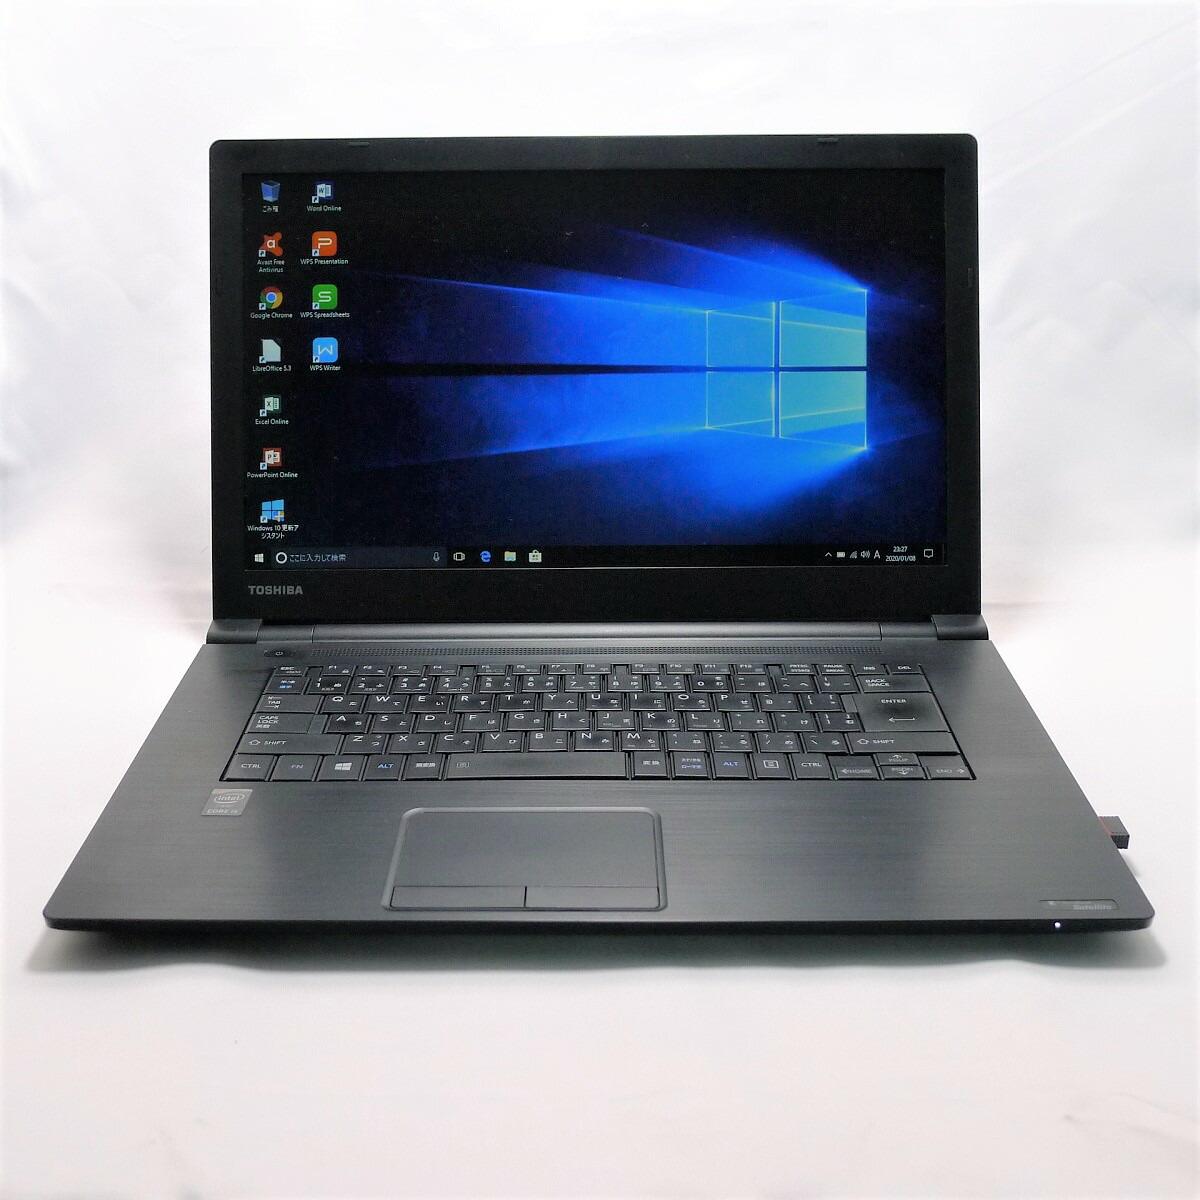 TOSHIBA dynabook Satellite B65 Core i5 16GB 新品SSD480GB DVD-ROM 無線LAN Windows10 64bitWPSOffice 15.6インチ 中古 中古パソコン 【中古】 ノートパソコン